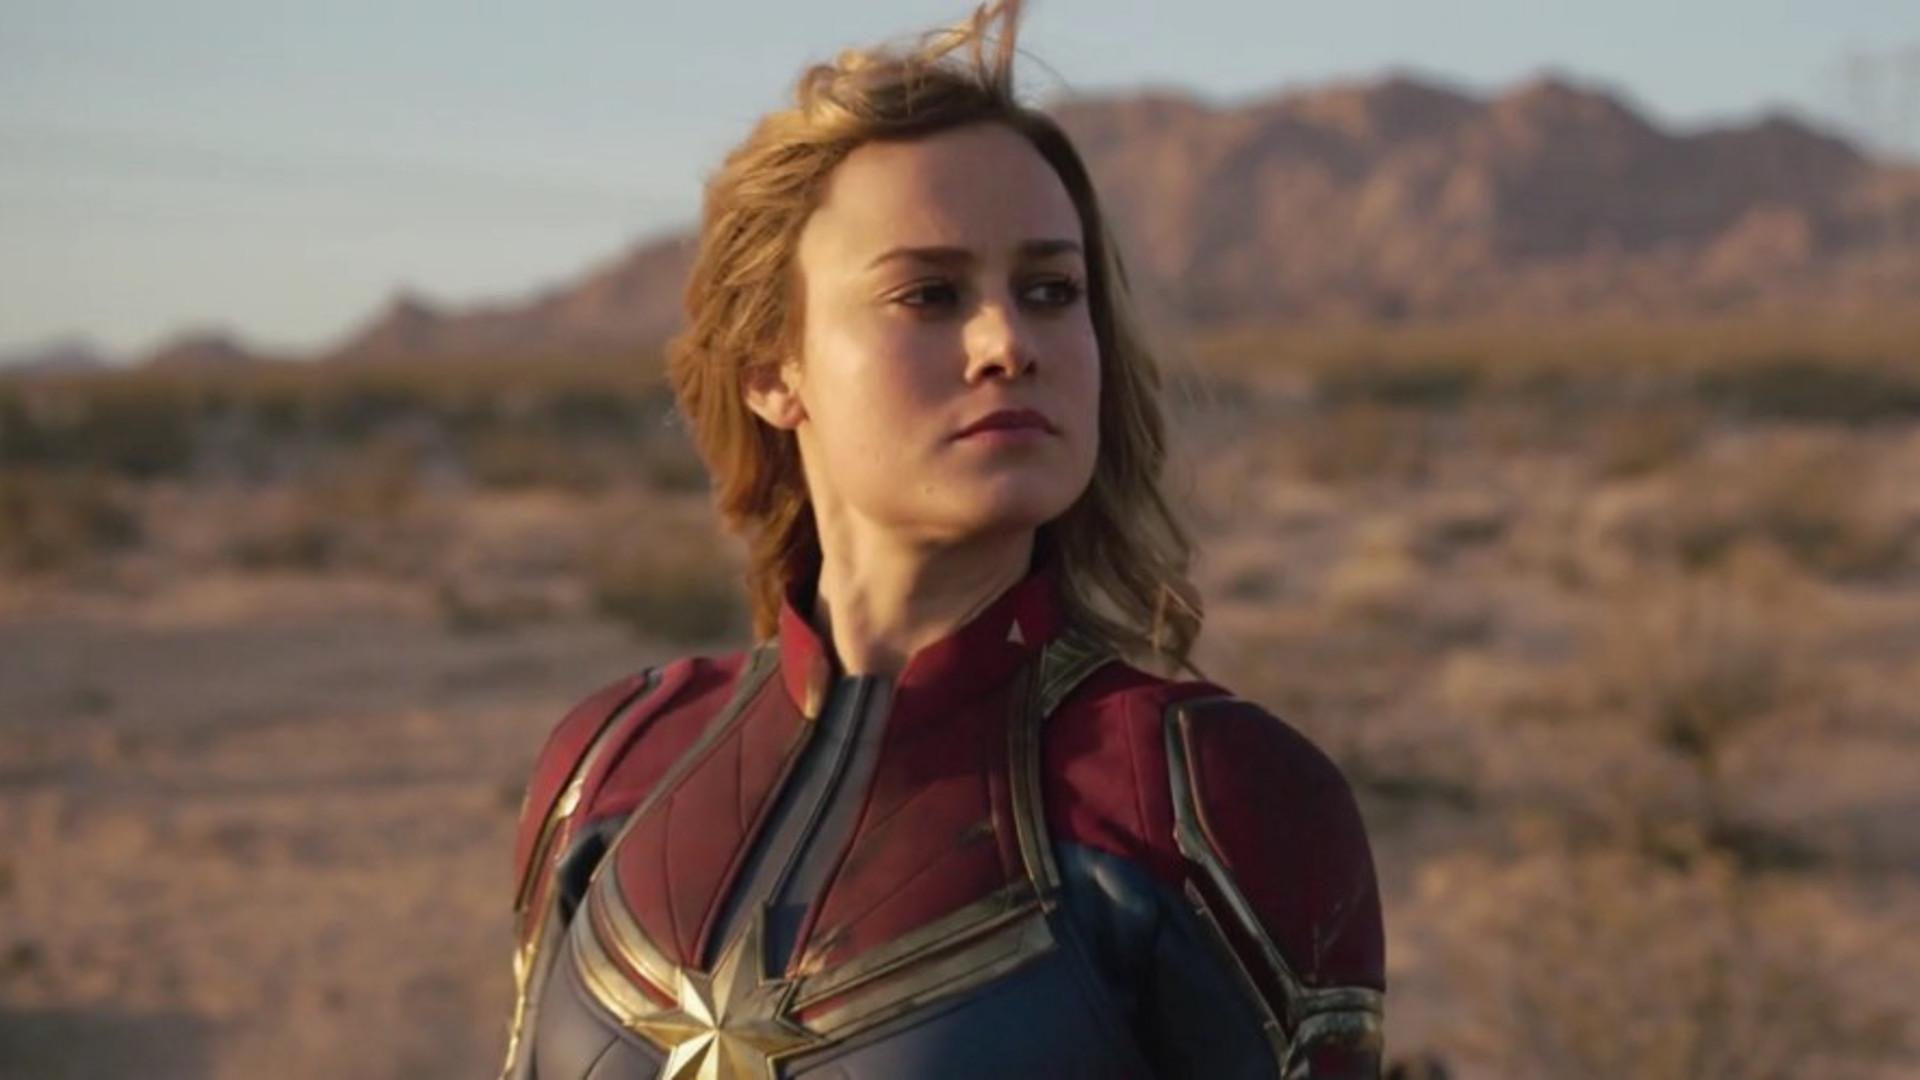 Captain Marvel star Brie Larson supports AbleGamers